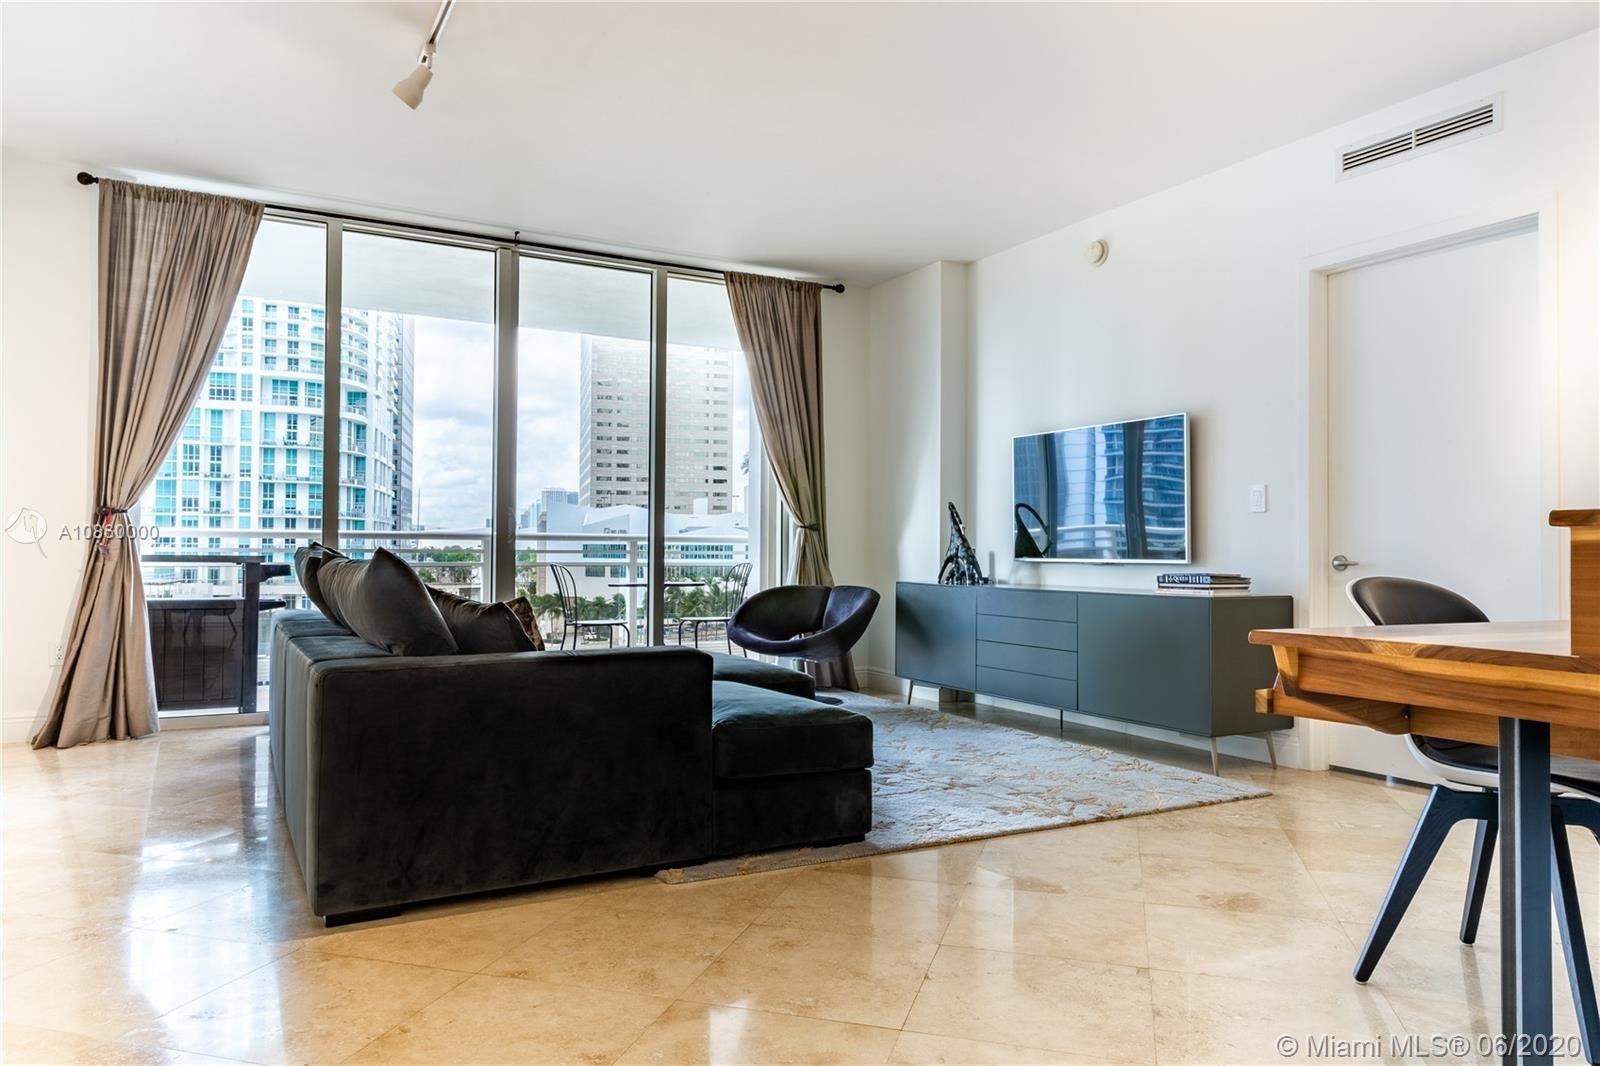 901 Brickell Key Blvd #605, Miami, FL 33131 - #: A10860000